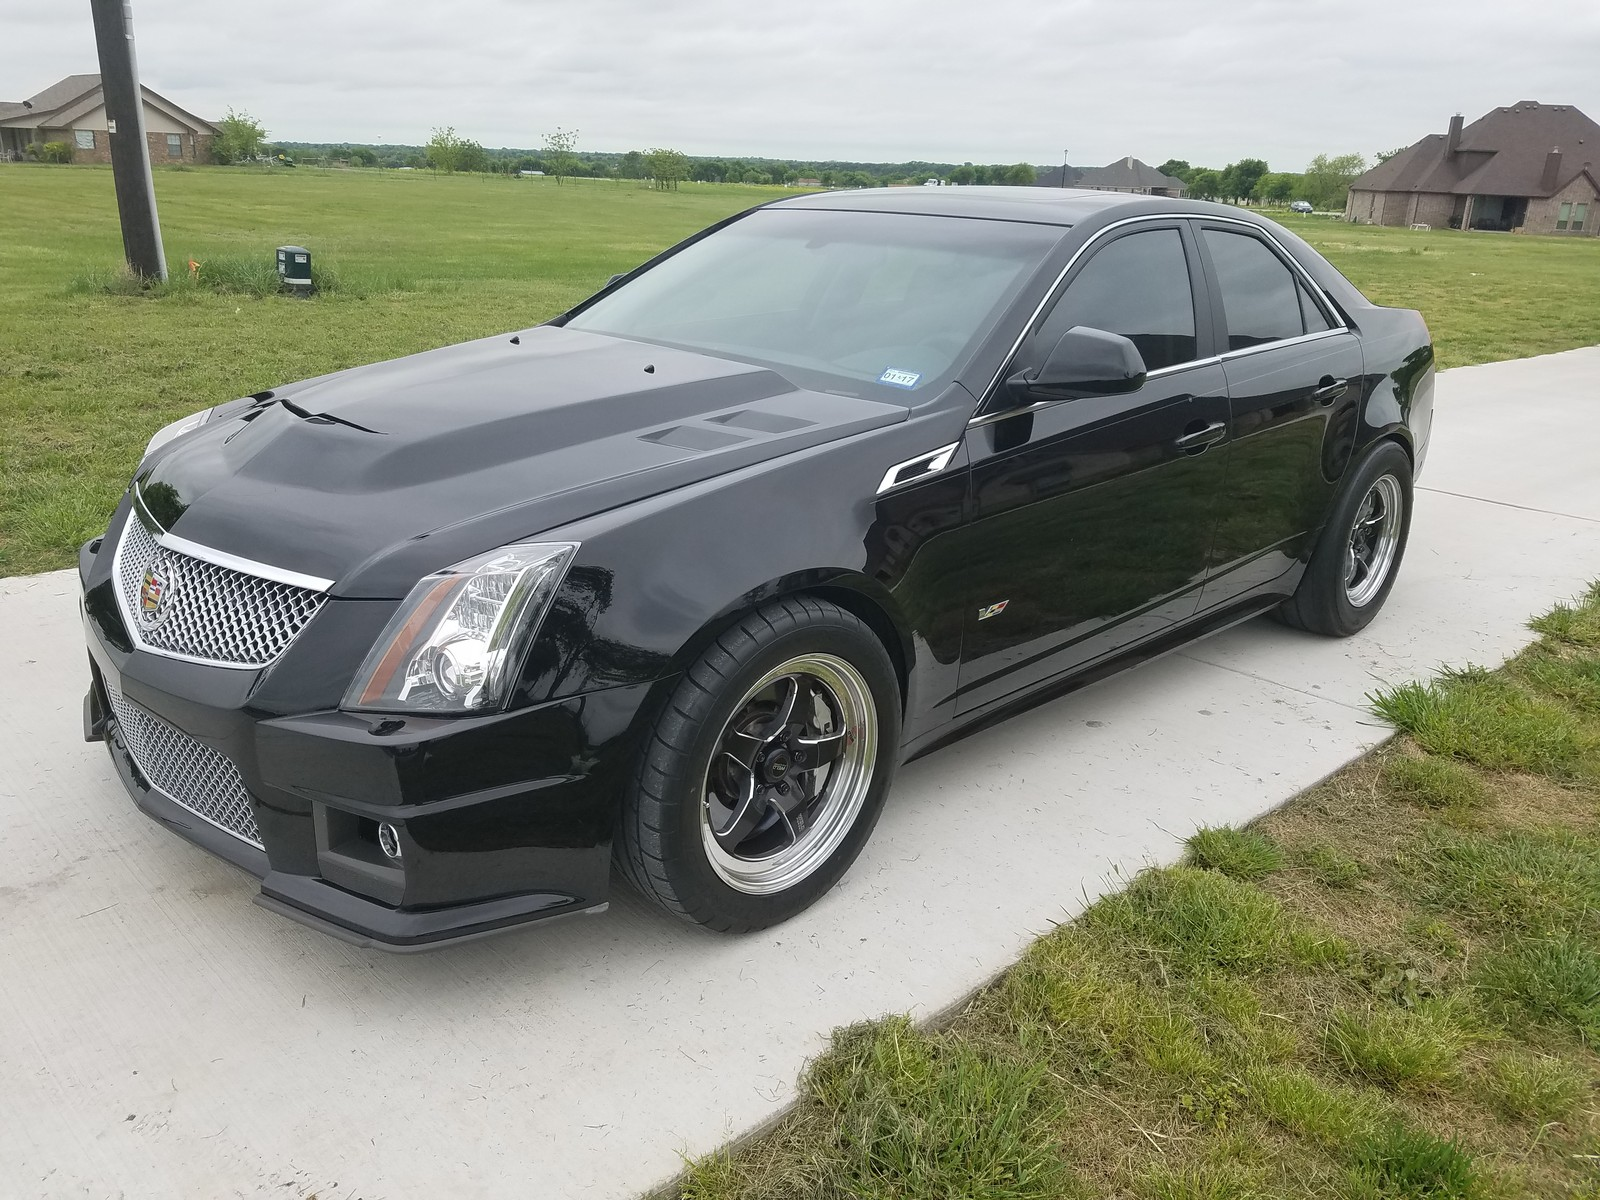 2012 Cadillac Cts V Sedan 1 4 Mile Drag Racing Timeslip